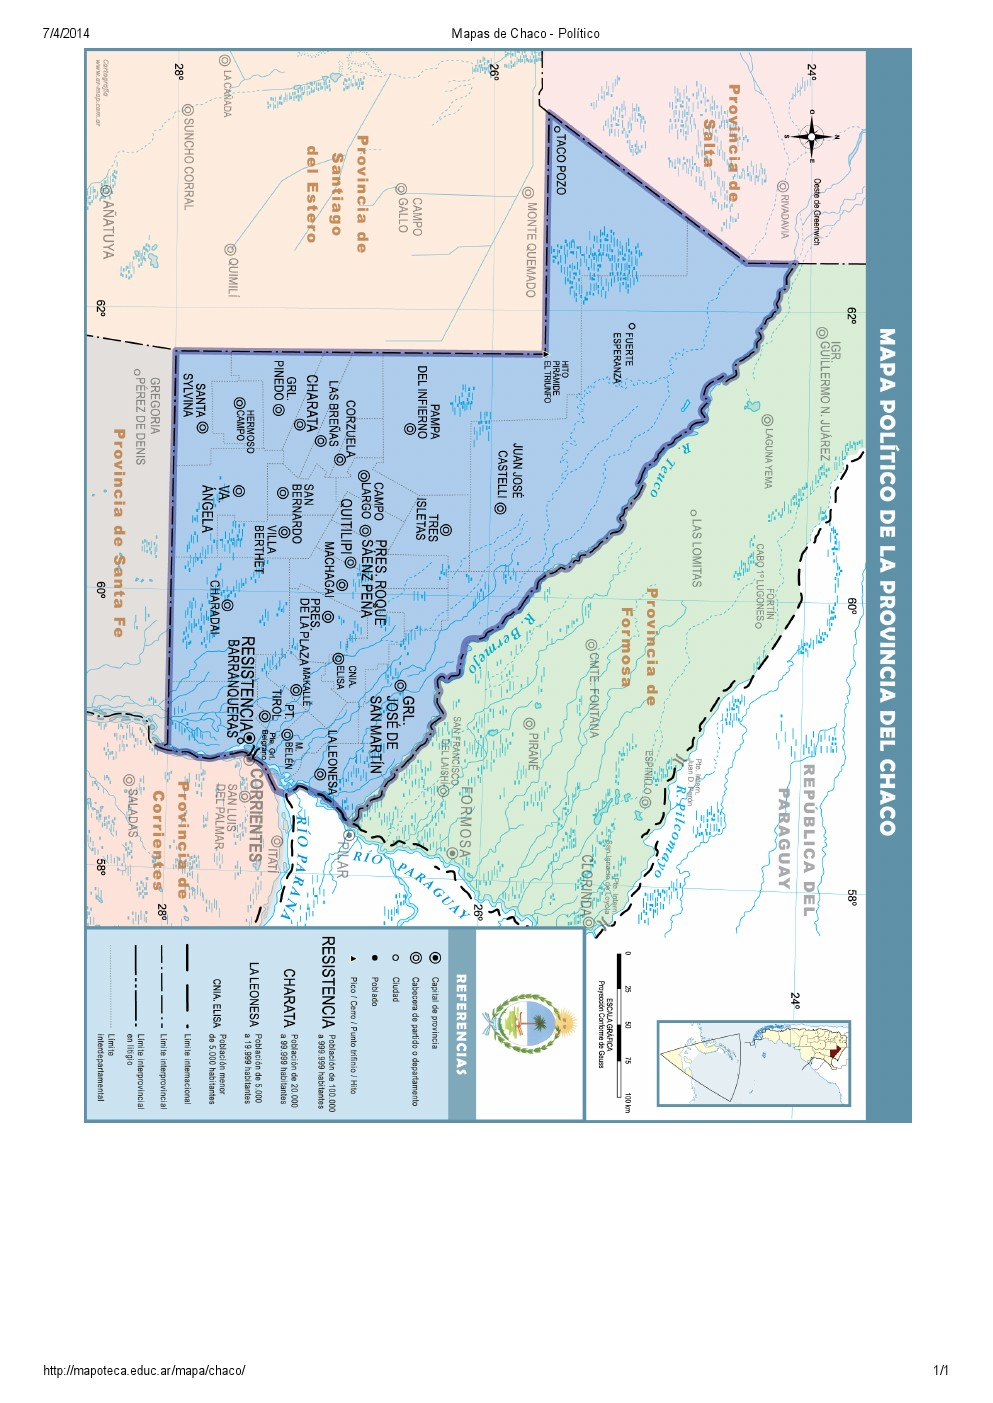 Mapa de capitales del Chaco. Mapoteca de Educ.ar